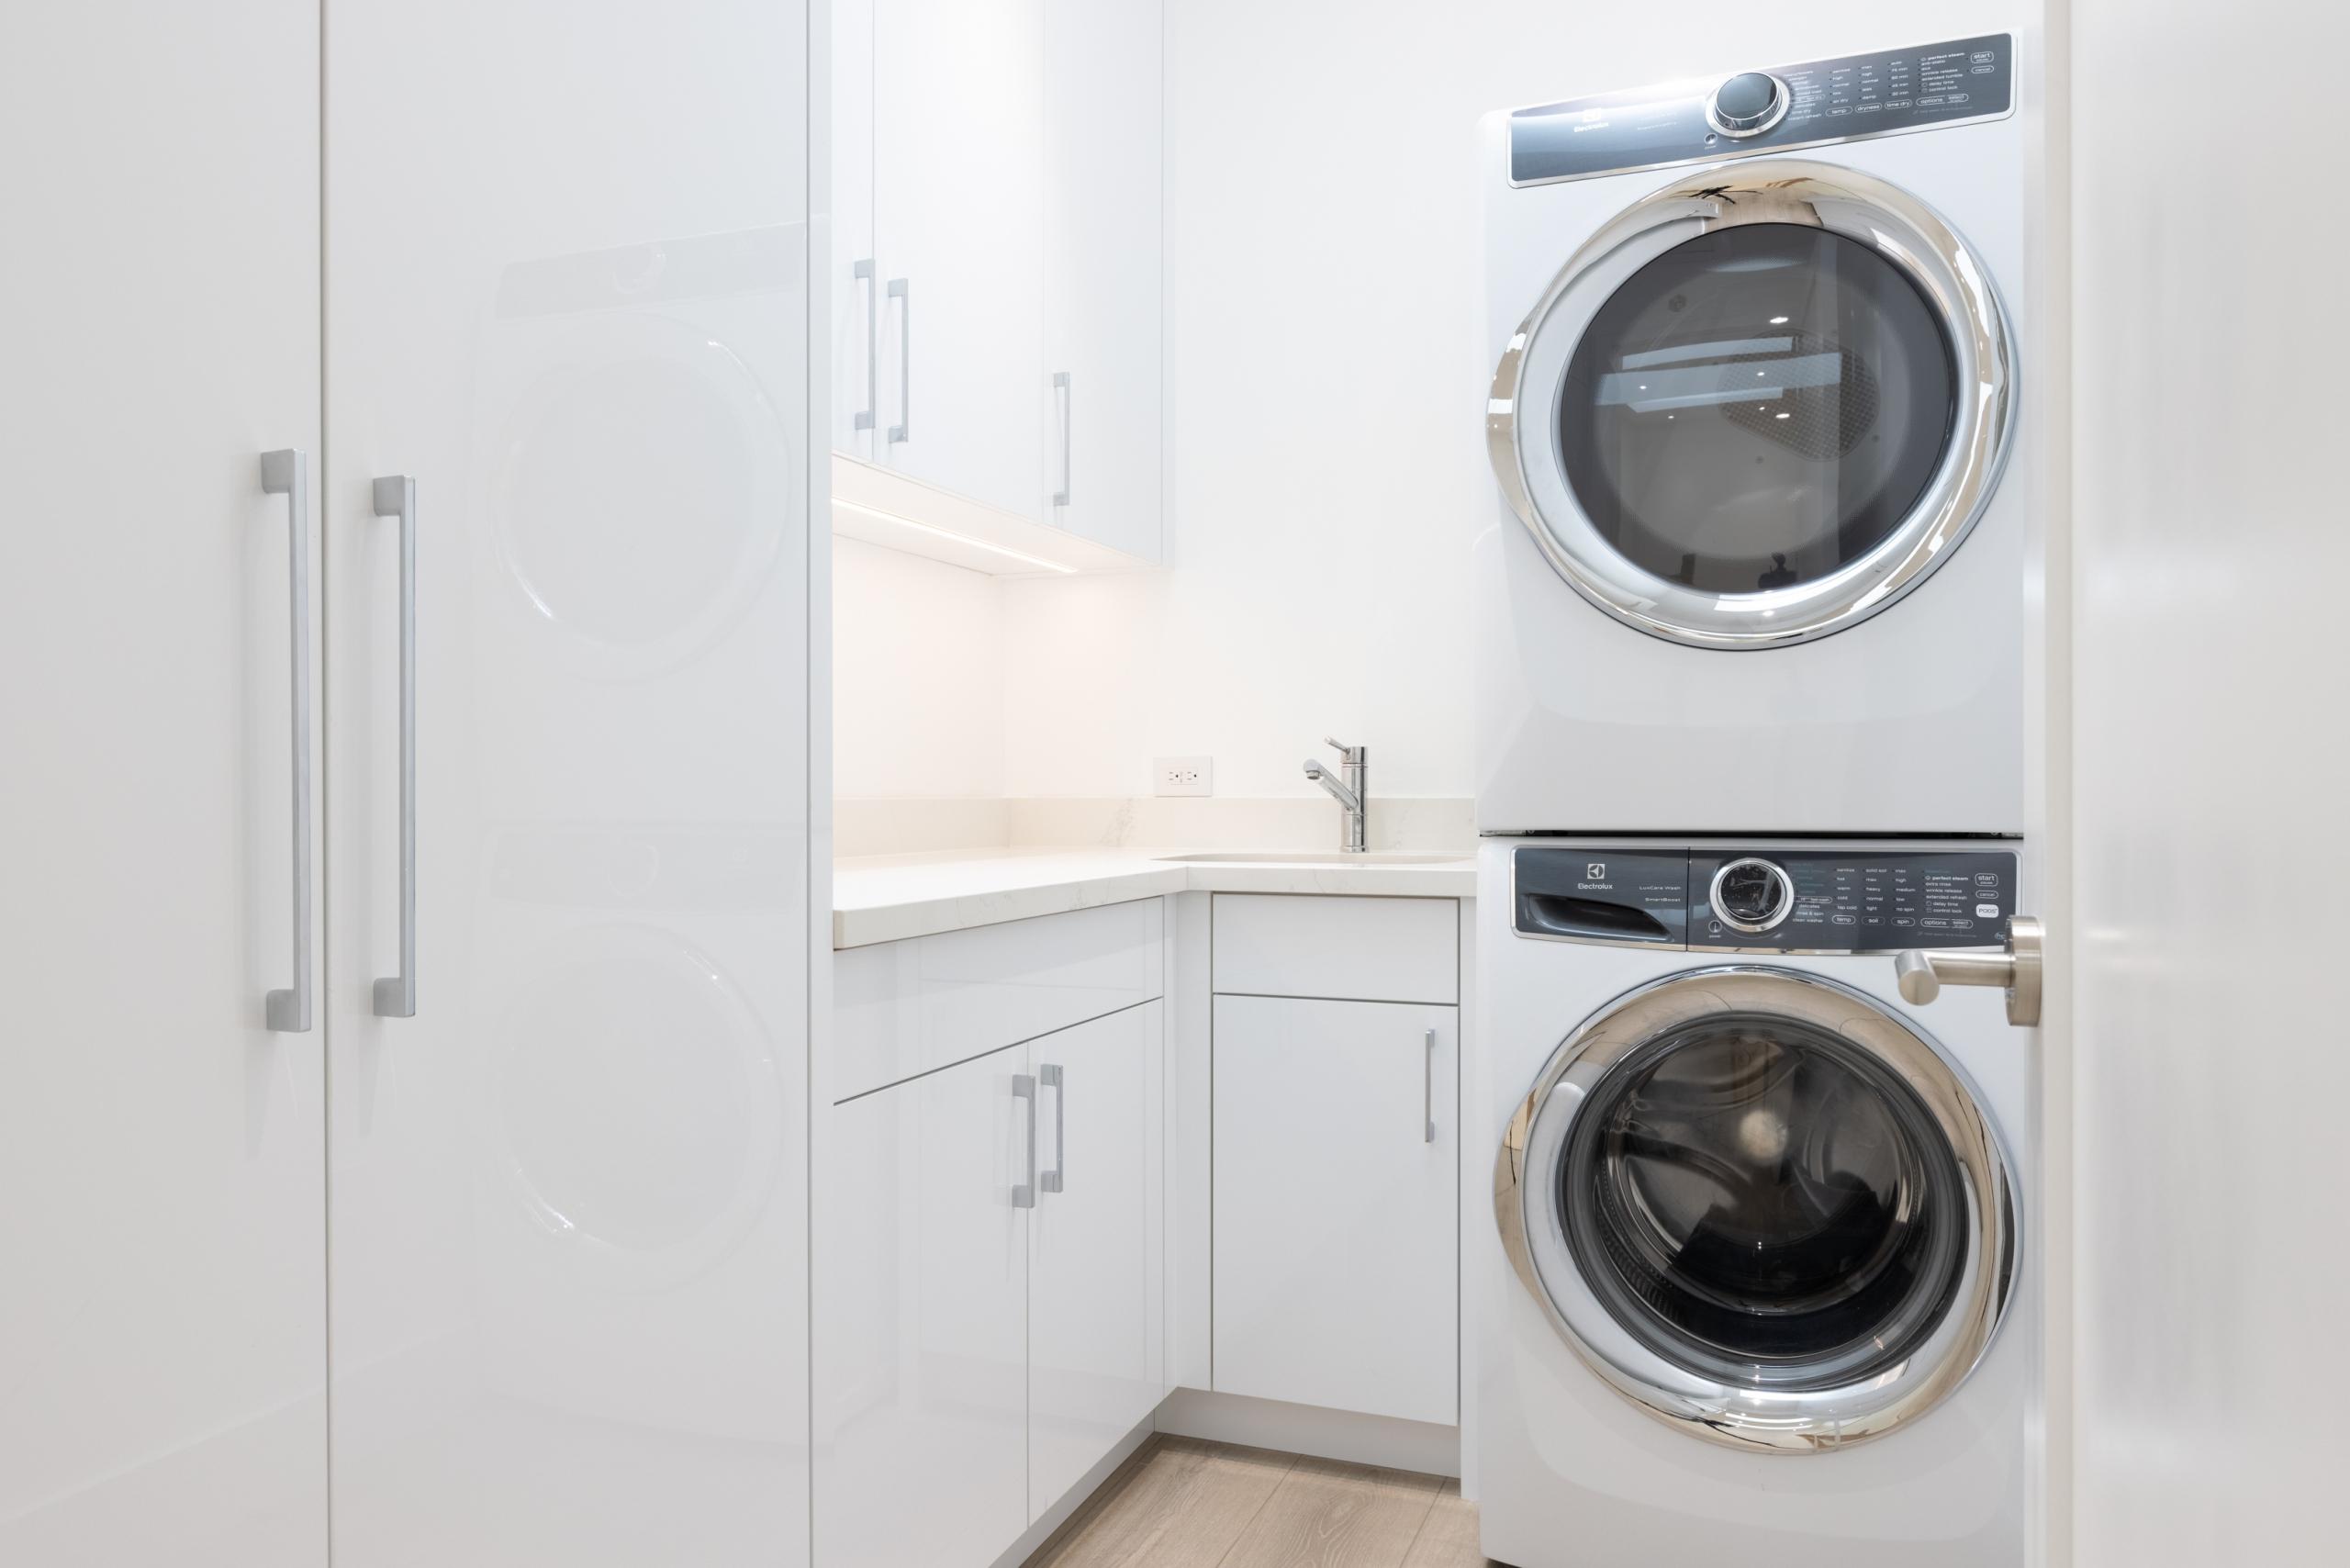 Laundry room featured at 287 Sabel Street, Oakville, ON at Alex Irish & Associates